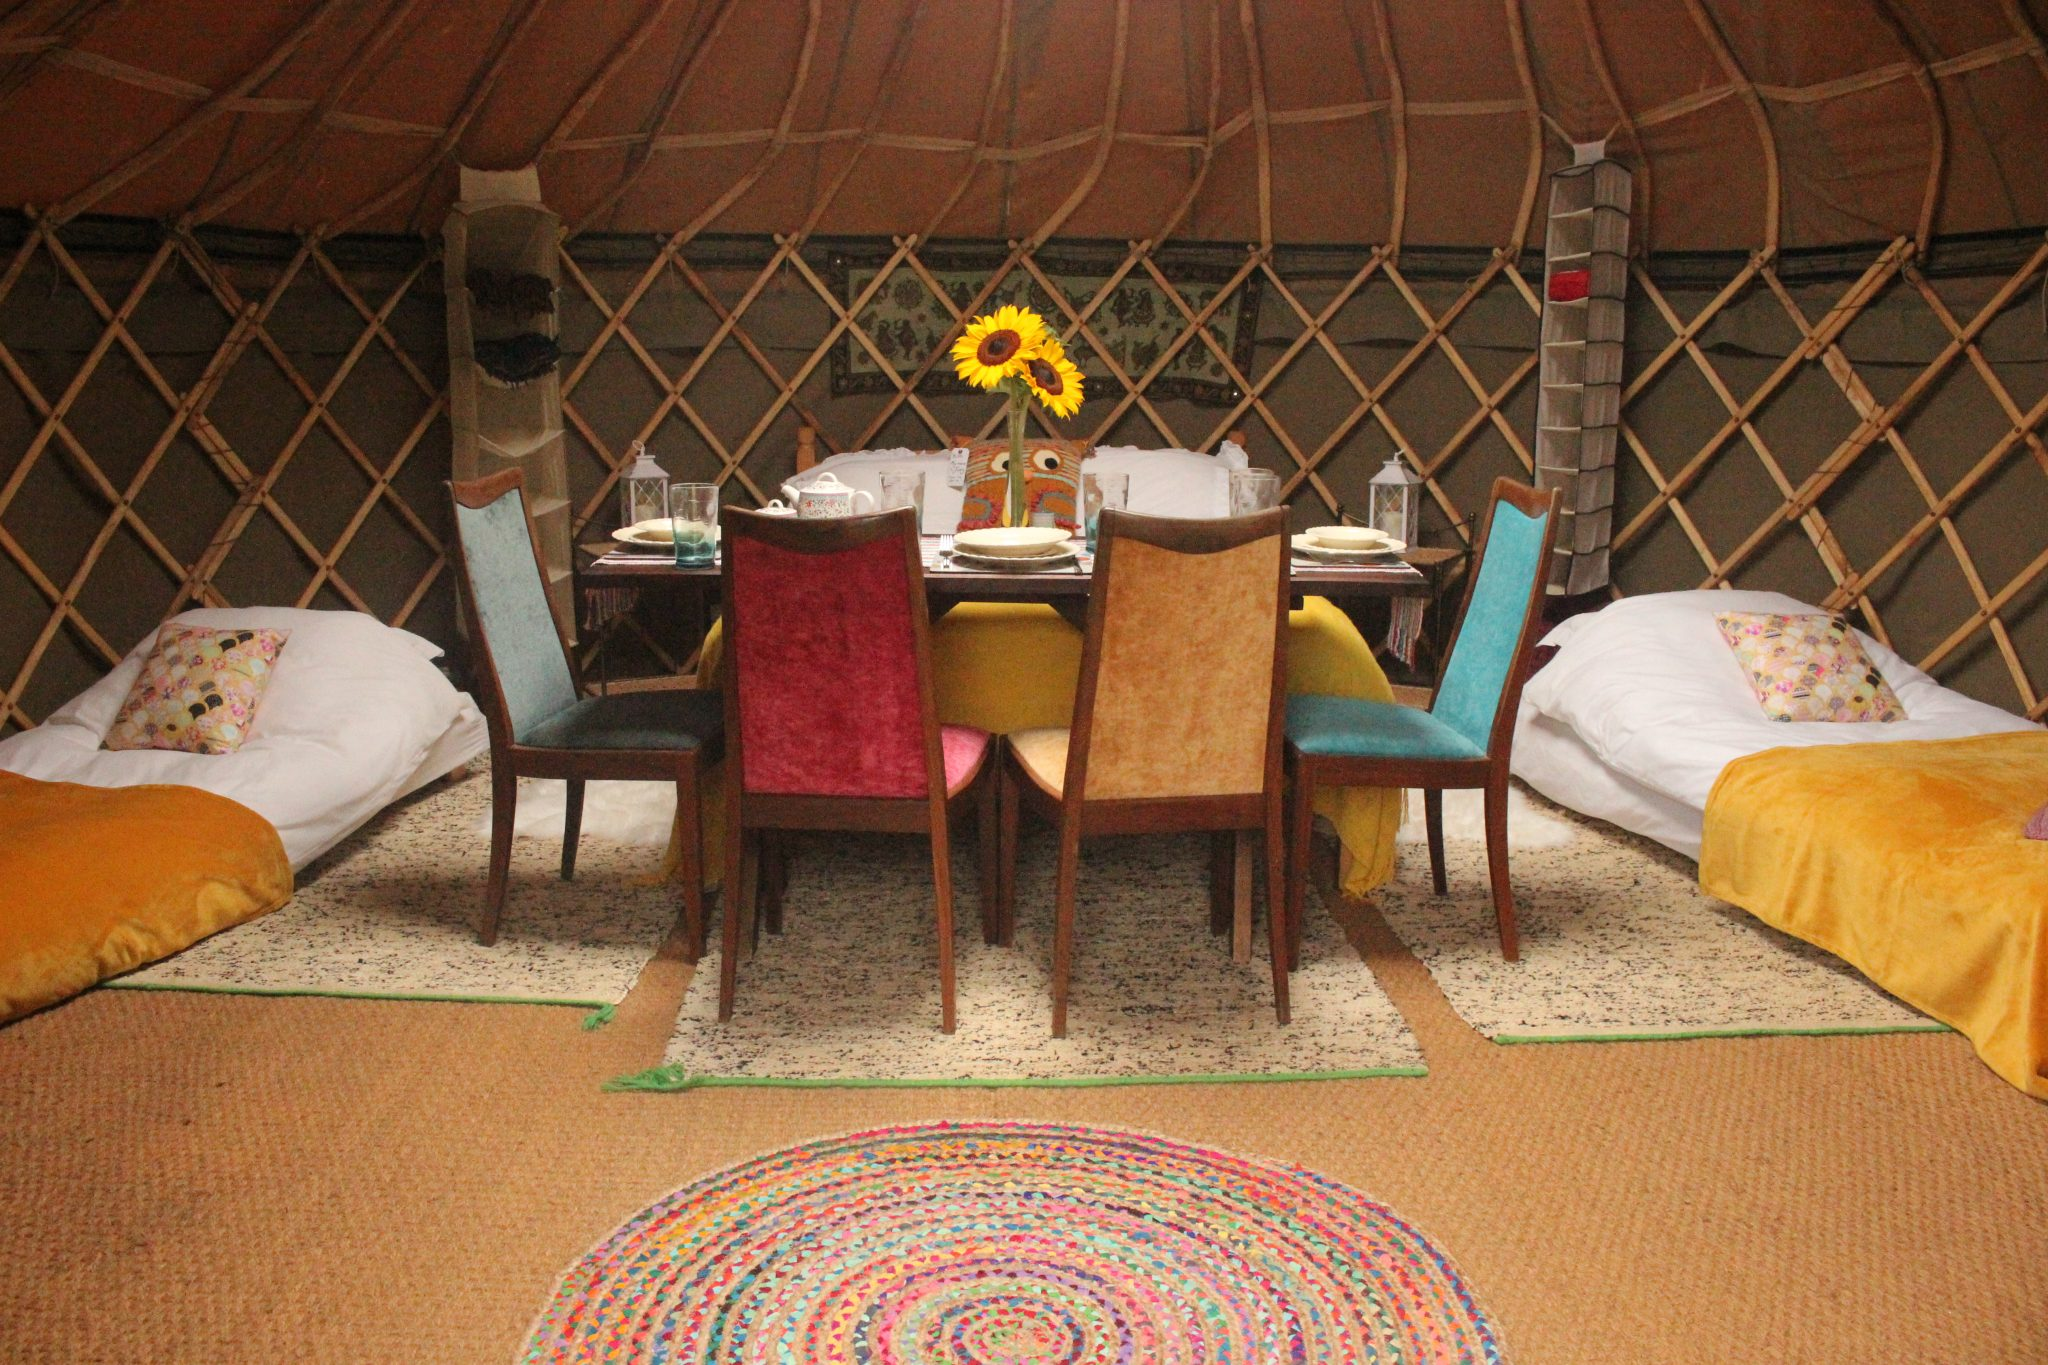 Handmade Yurts ⋆ Stackpole Under The Stars